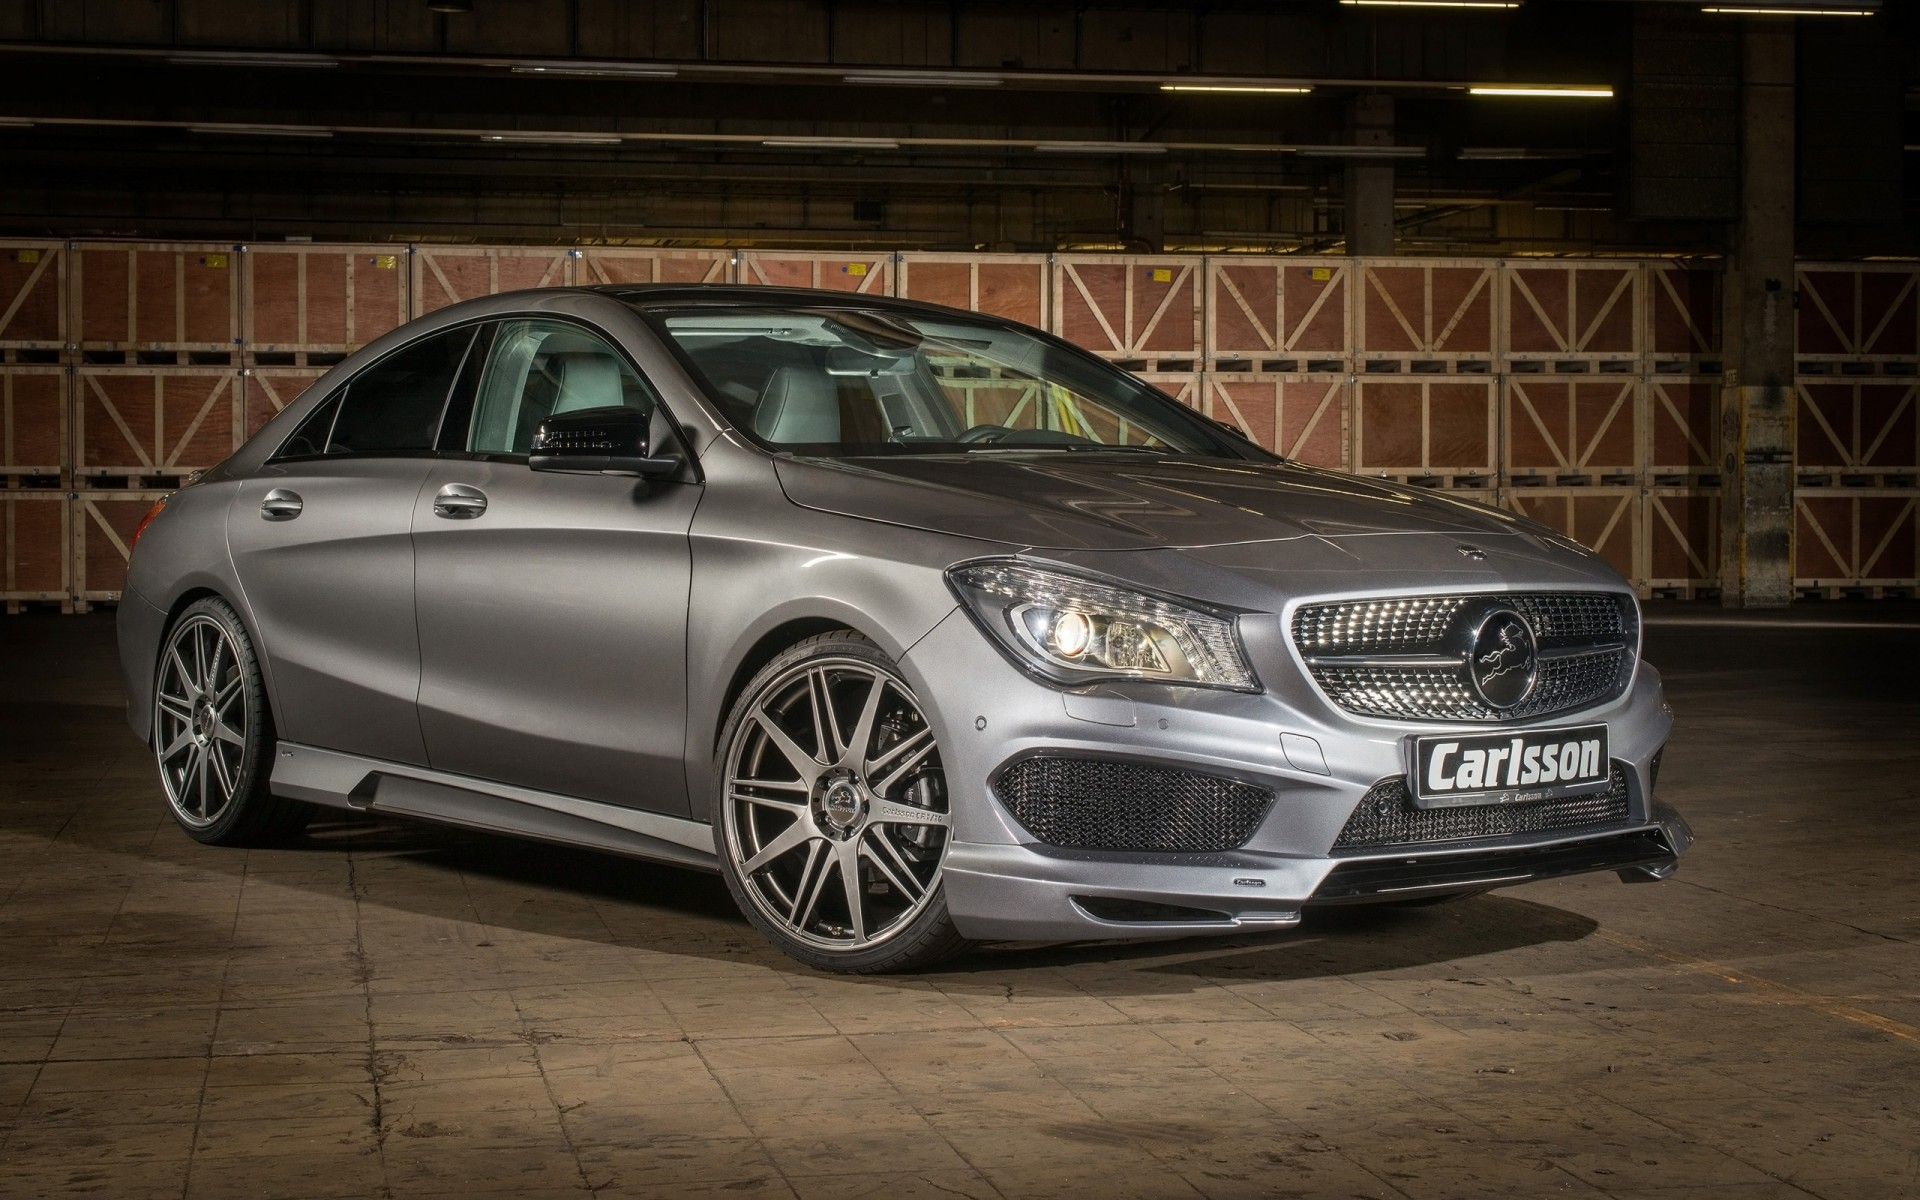 2014 carlsson mercedes benz cla45 amg wallpaper hd car for Mercedes benz carlsson